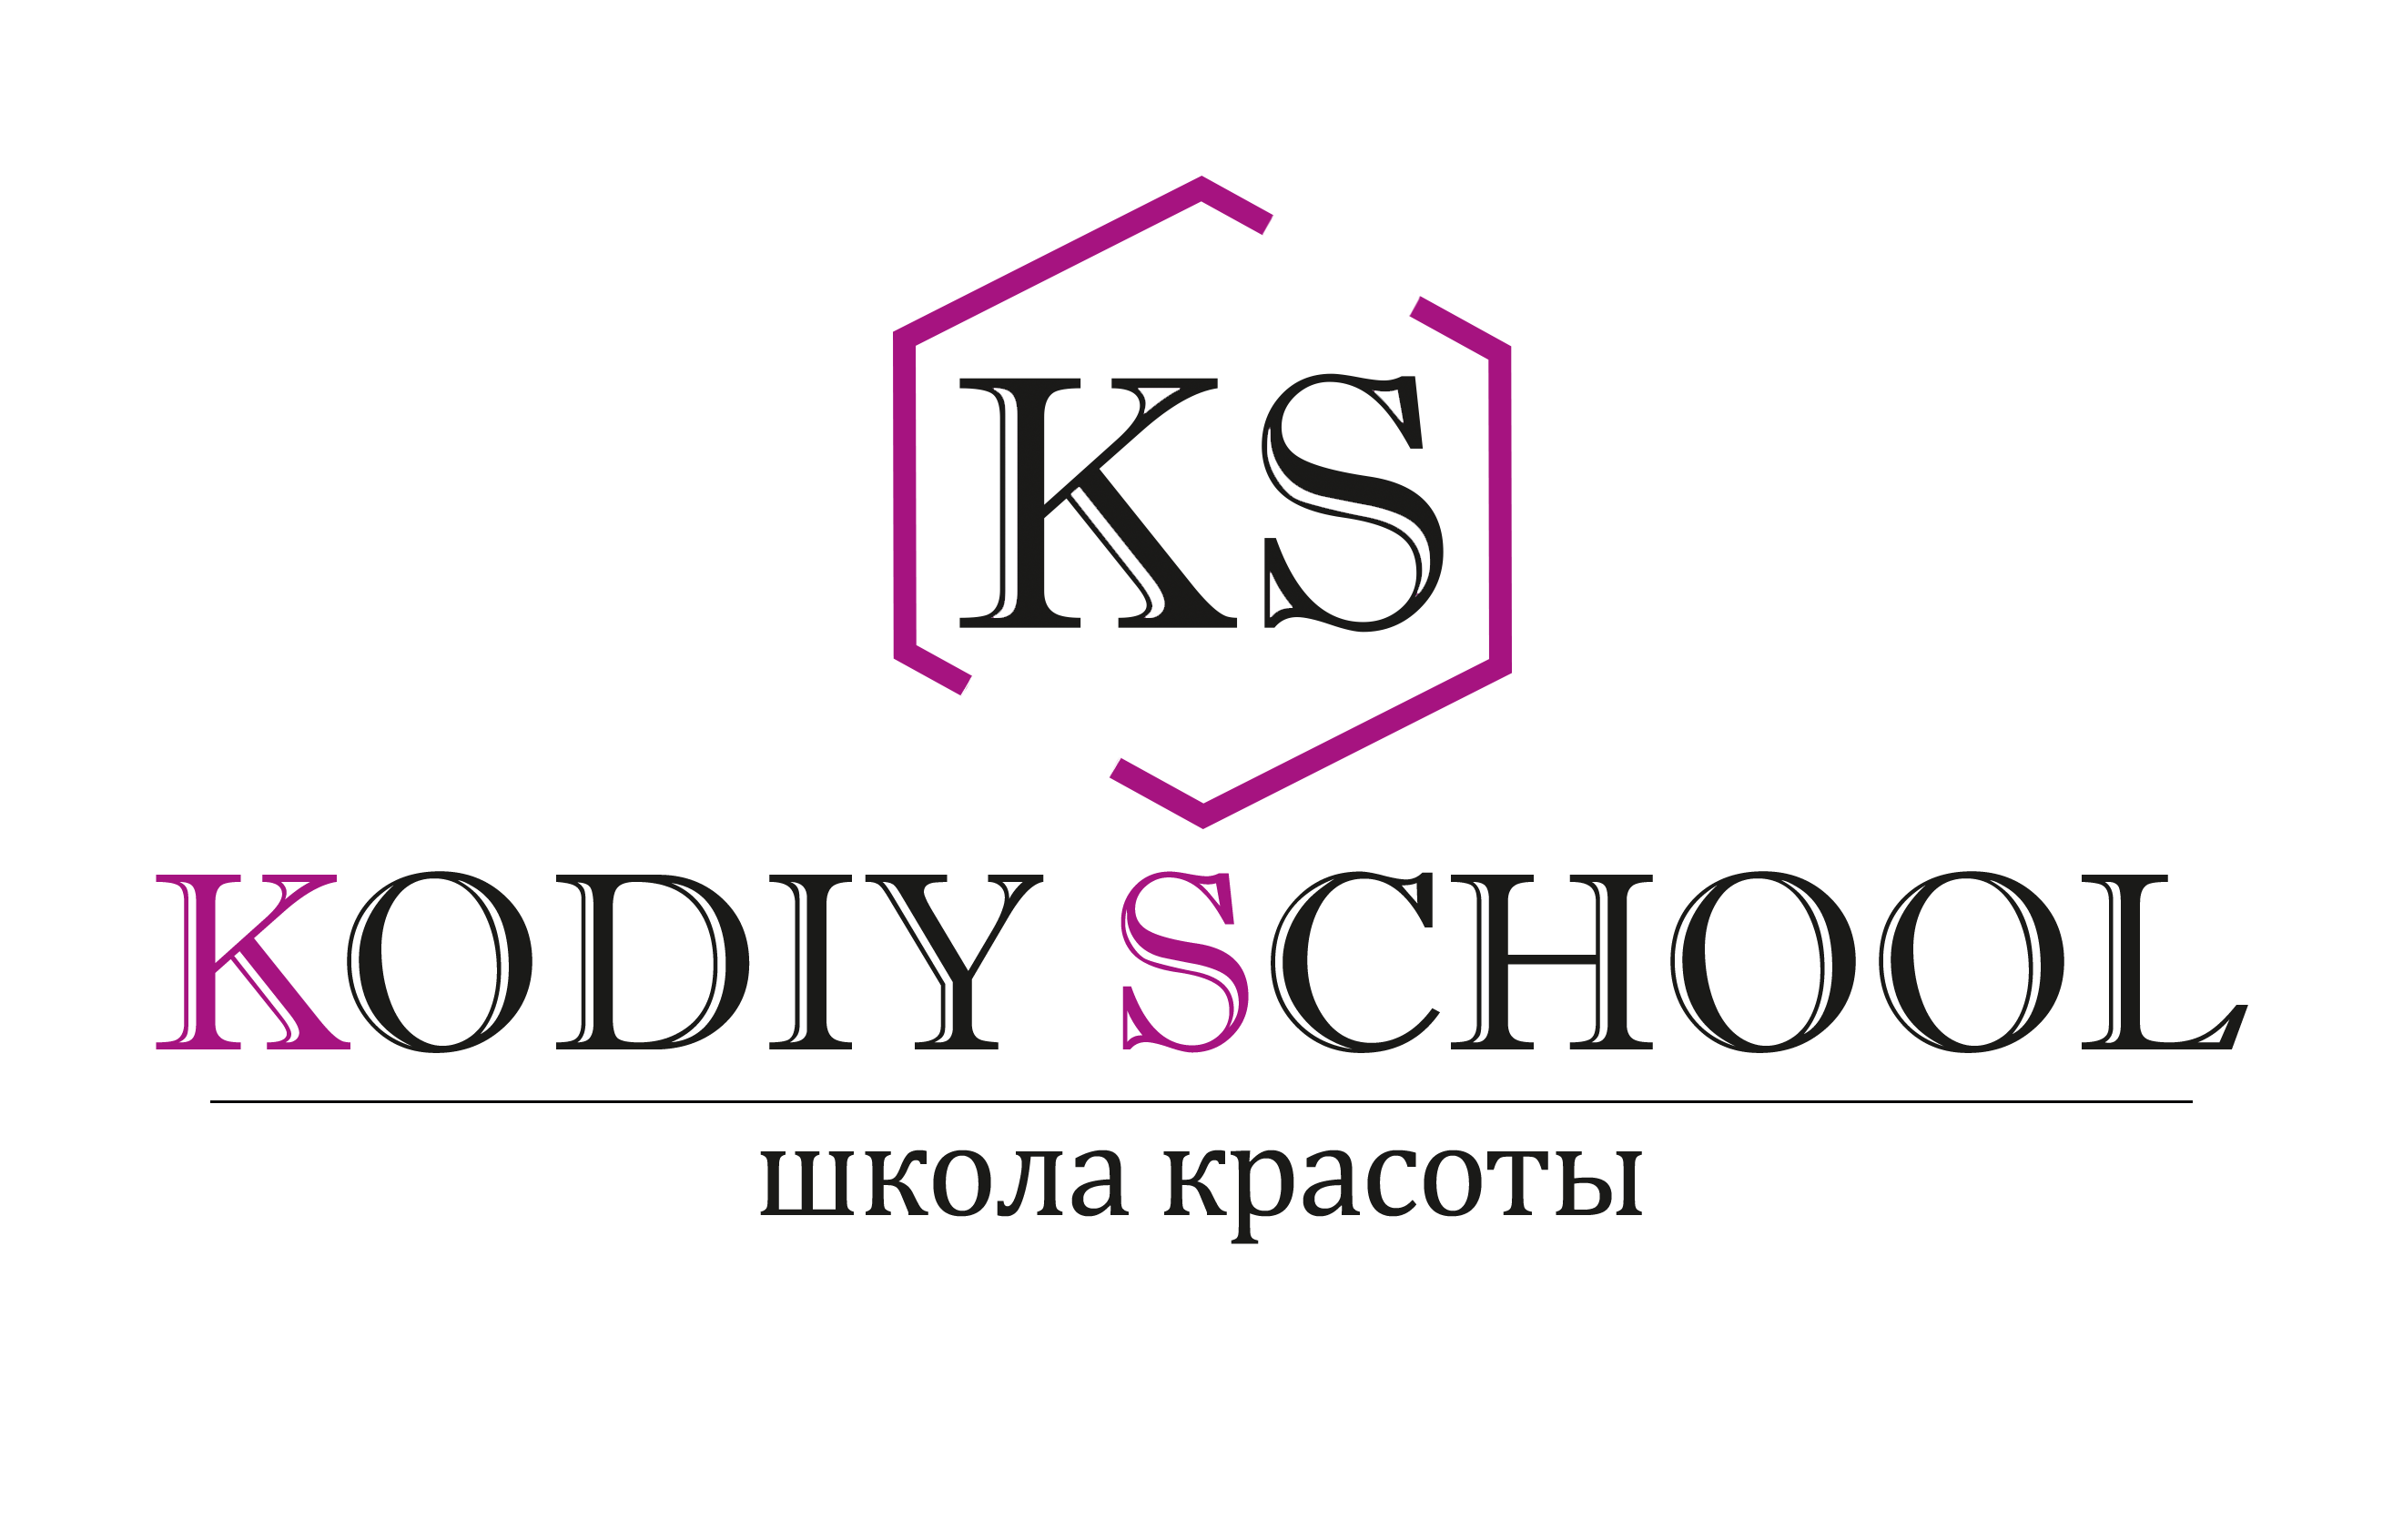 KODIY School. Школа красоты Кодий Скул